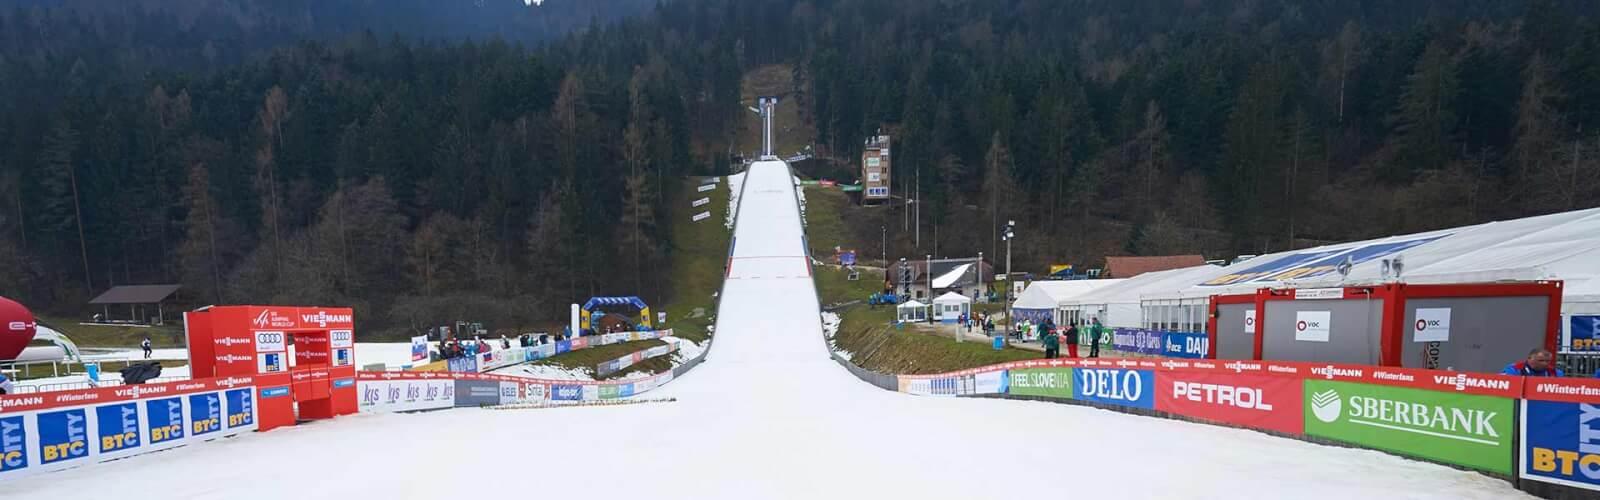 ski-jumping-ljubno-banner